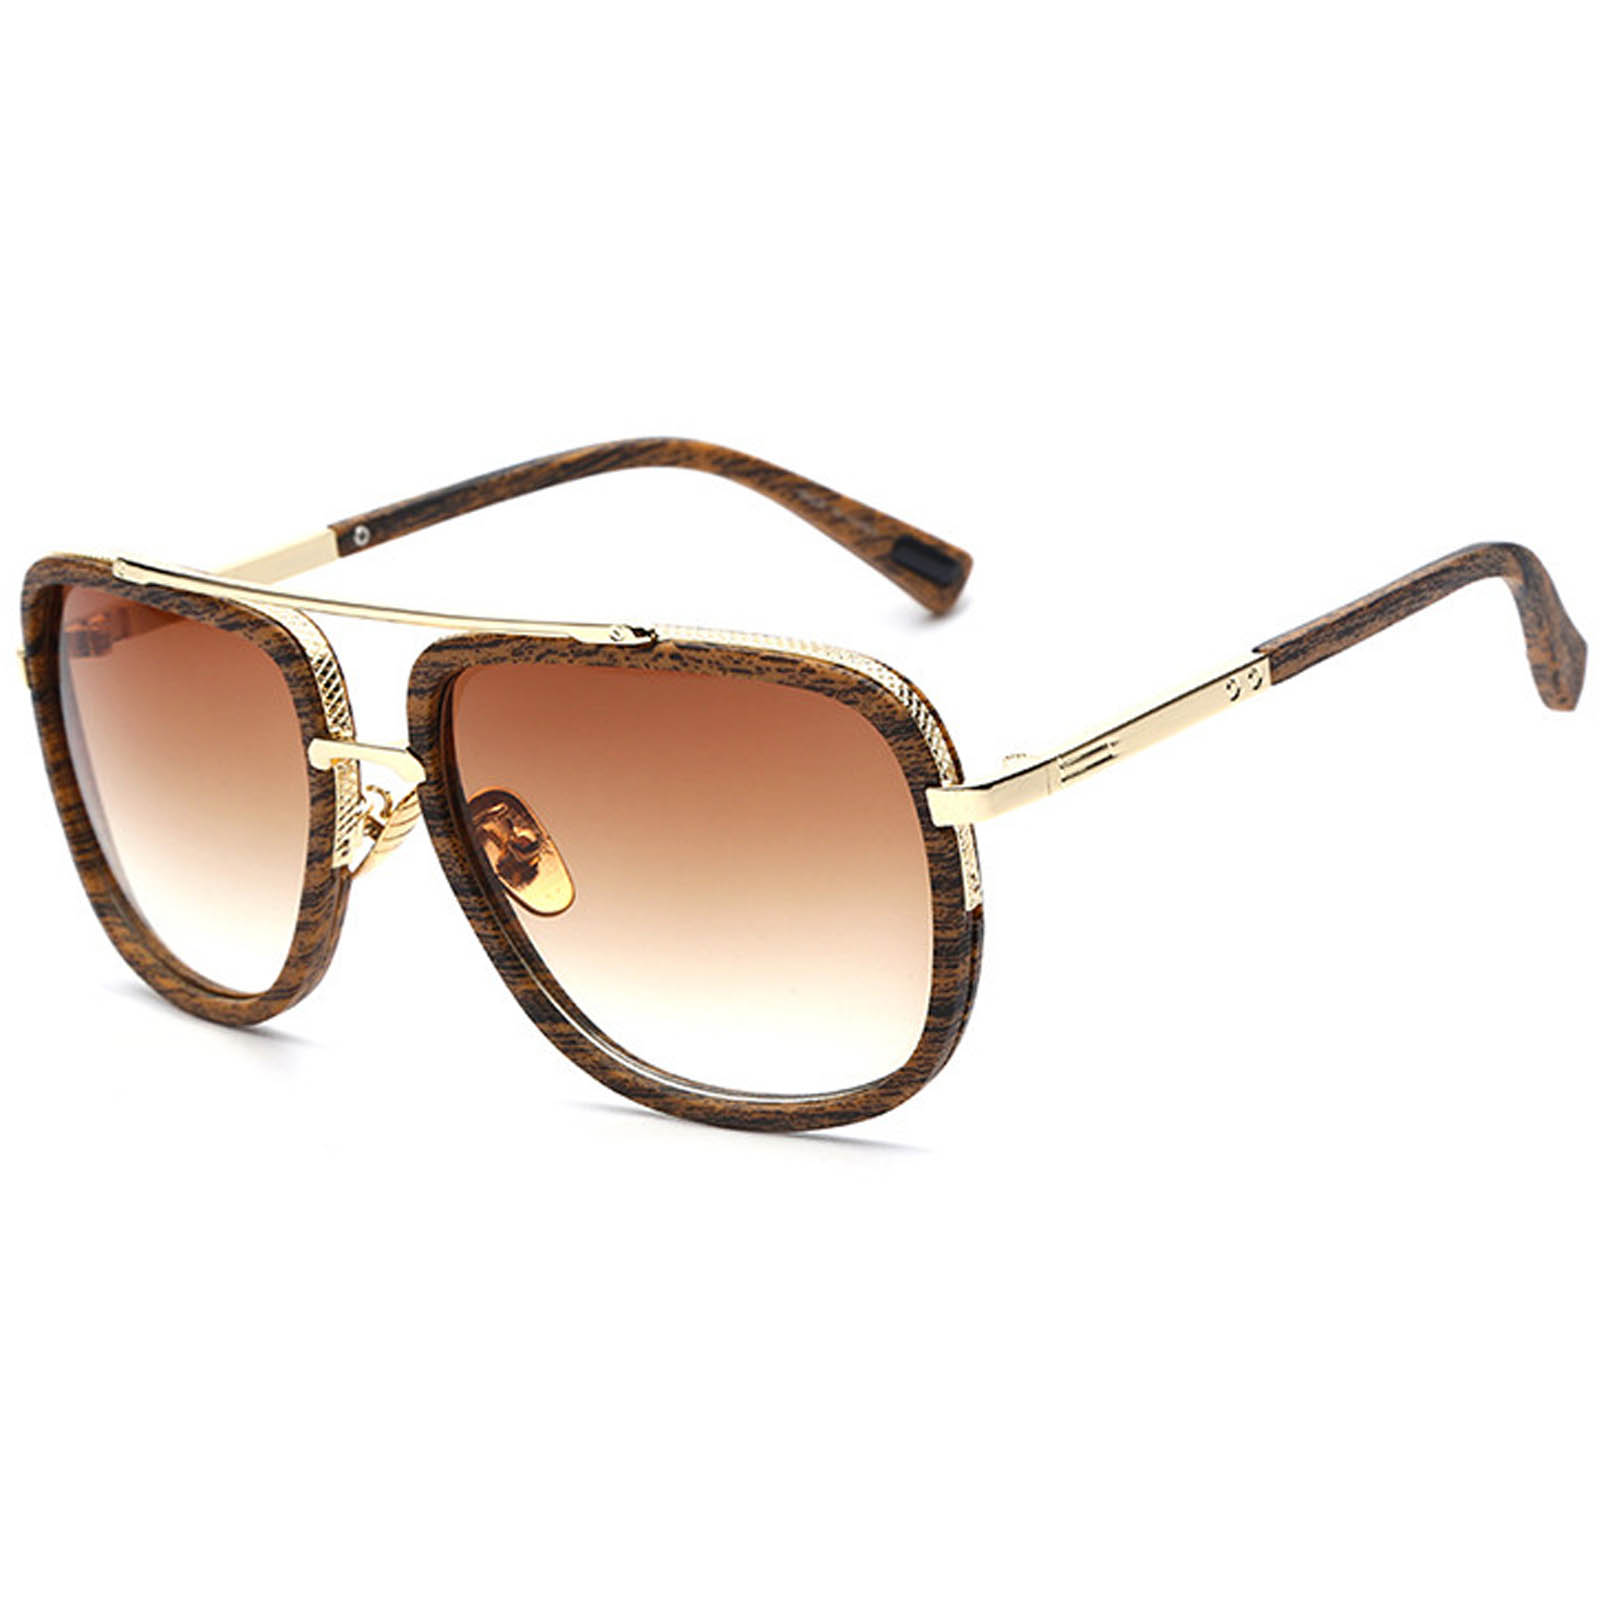 OWL ® 011 C8 Eyewear Sunglasses Women\'s Men\'s Metal Wood Frame Brown ...